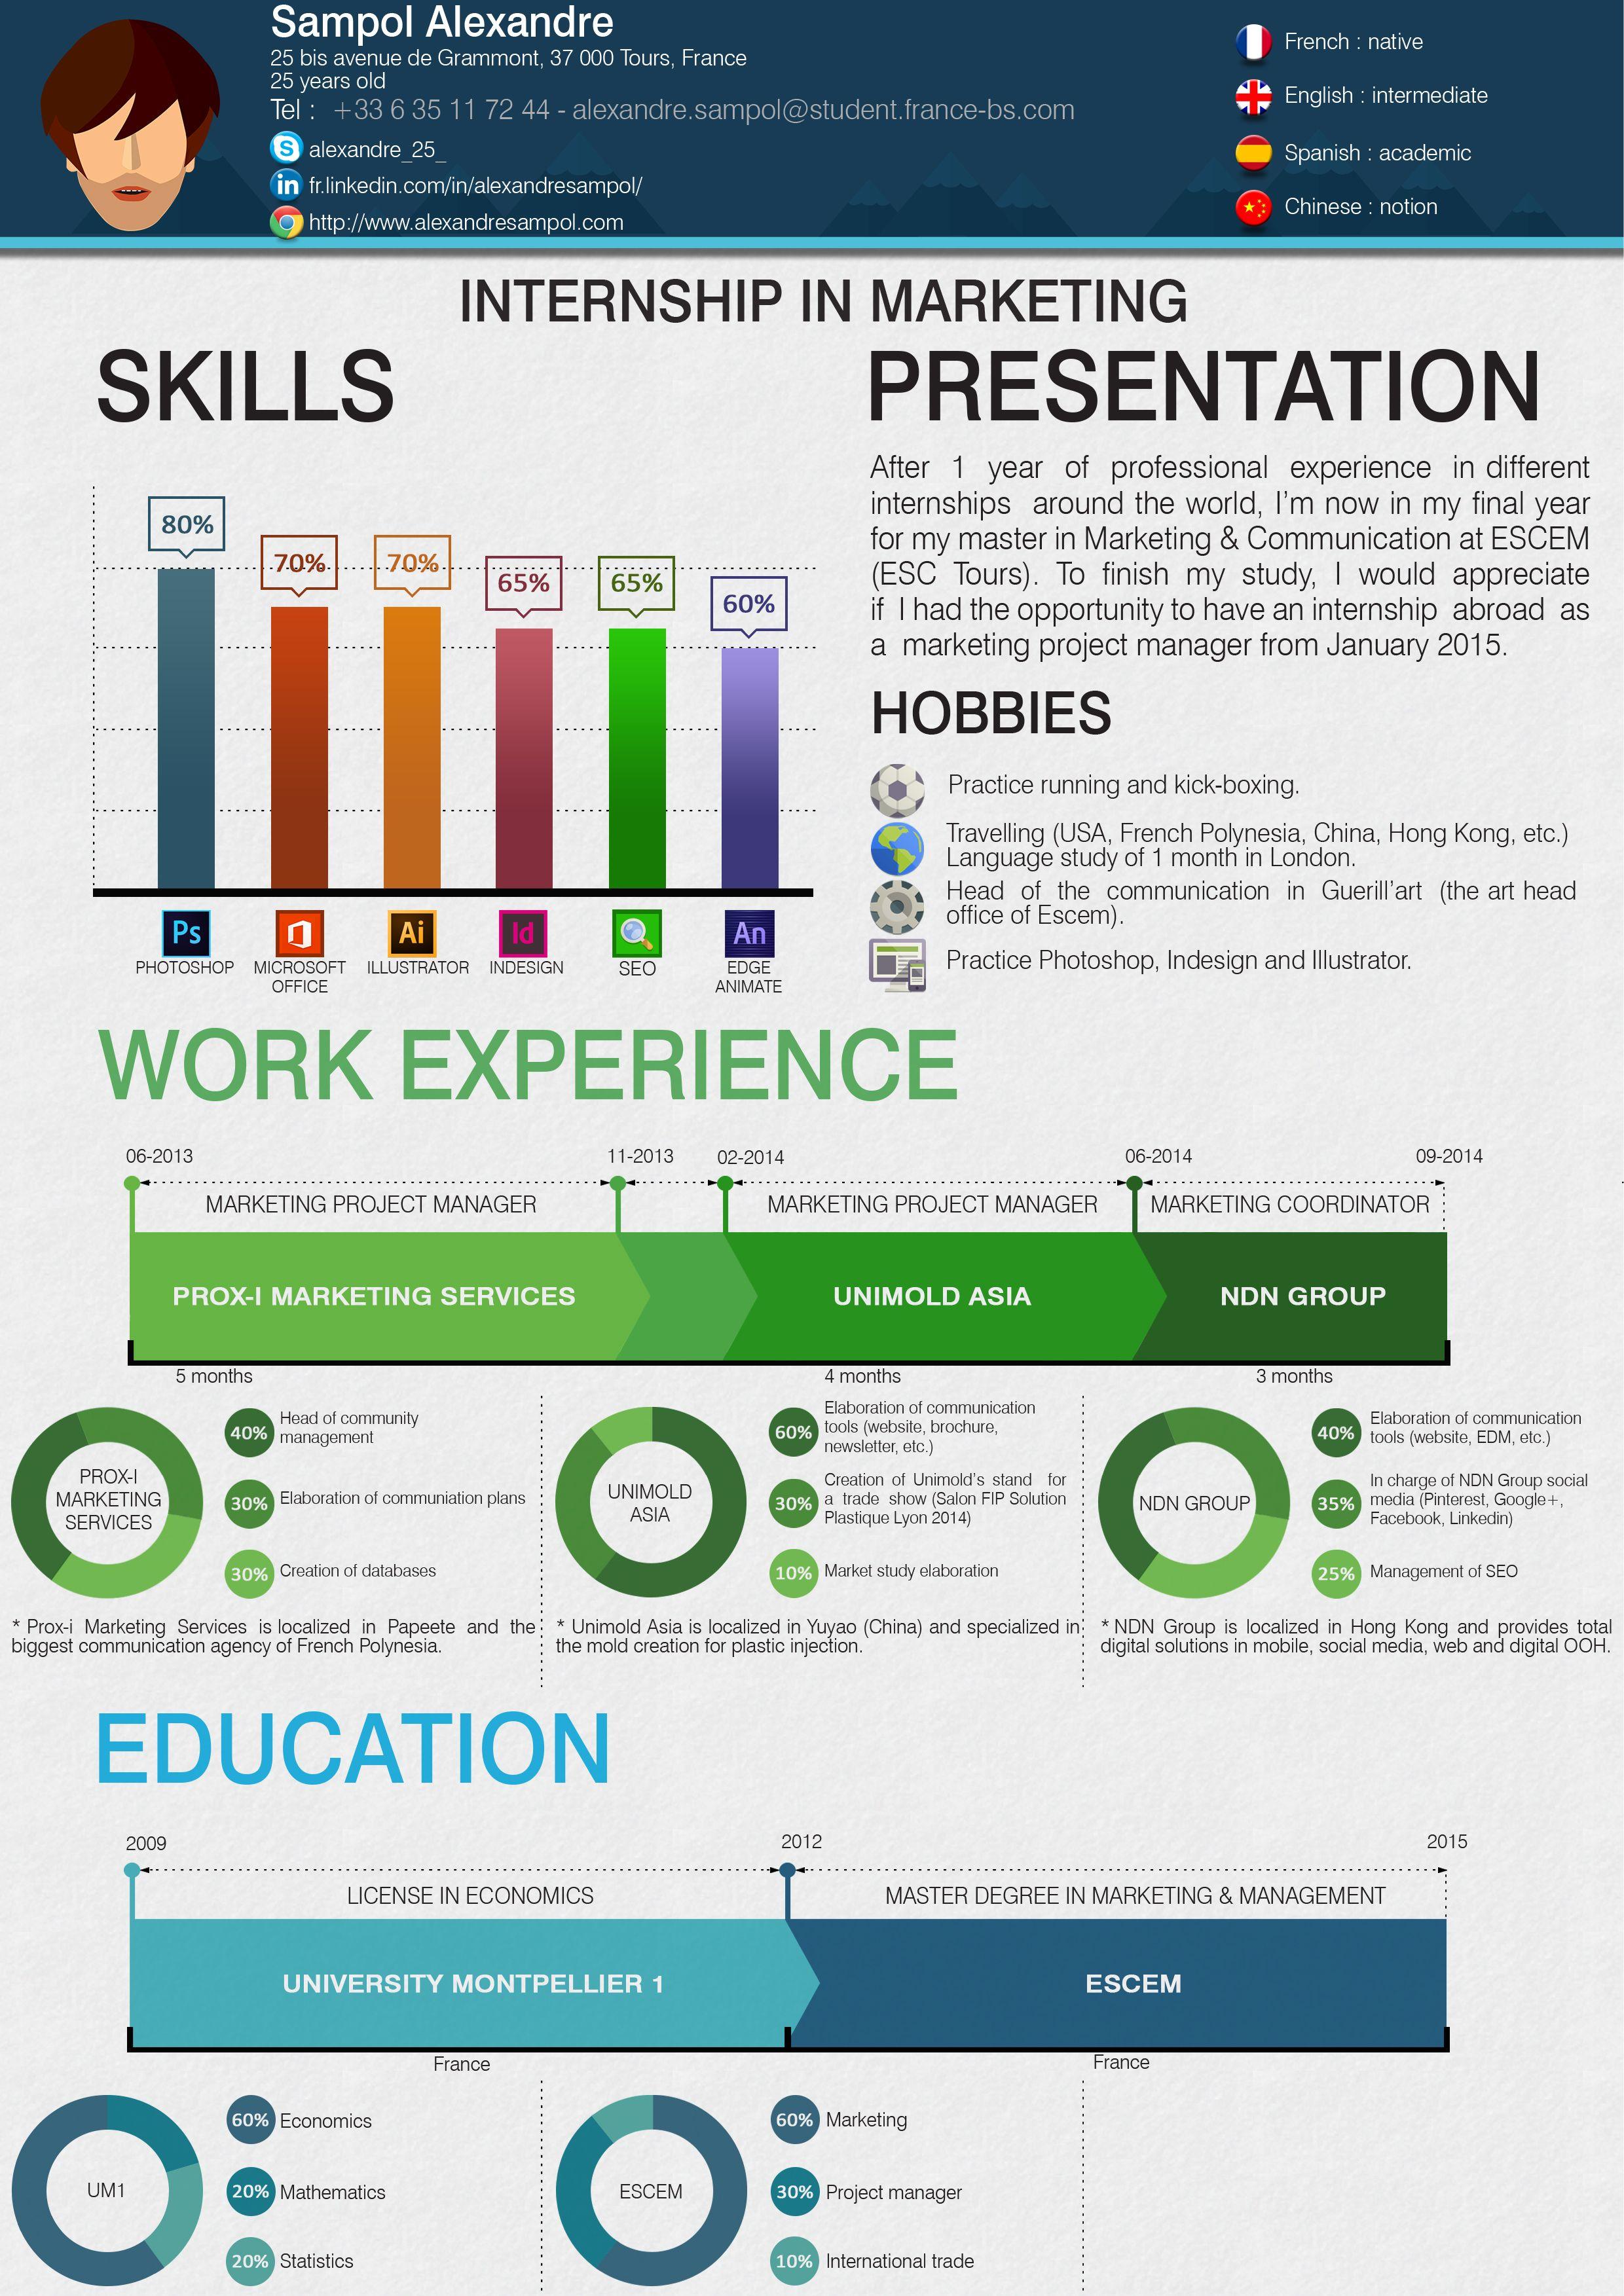 Cv Alexandre Sampol 2015 Cv Internship Marketing Projectmanager Marketing Skills Change Management Marketing